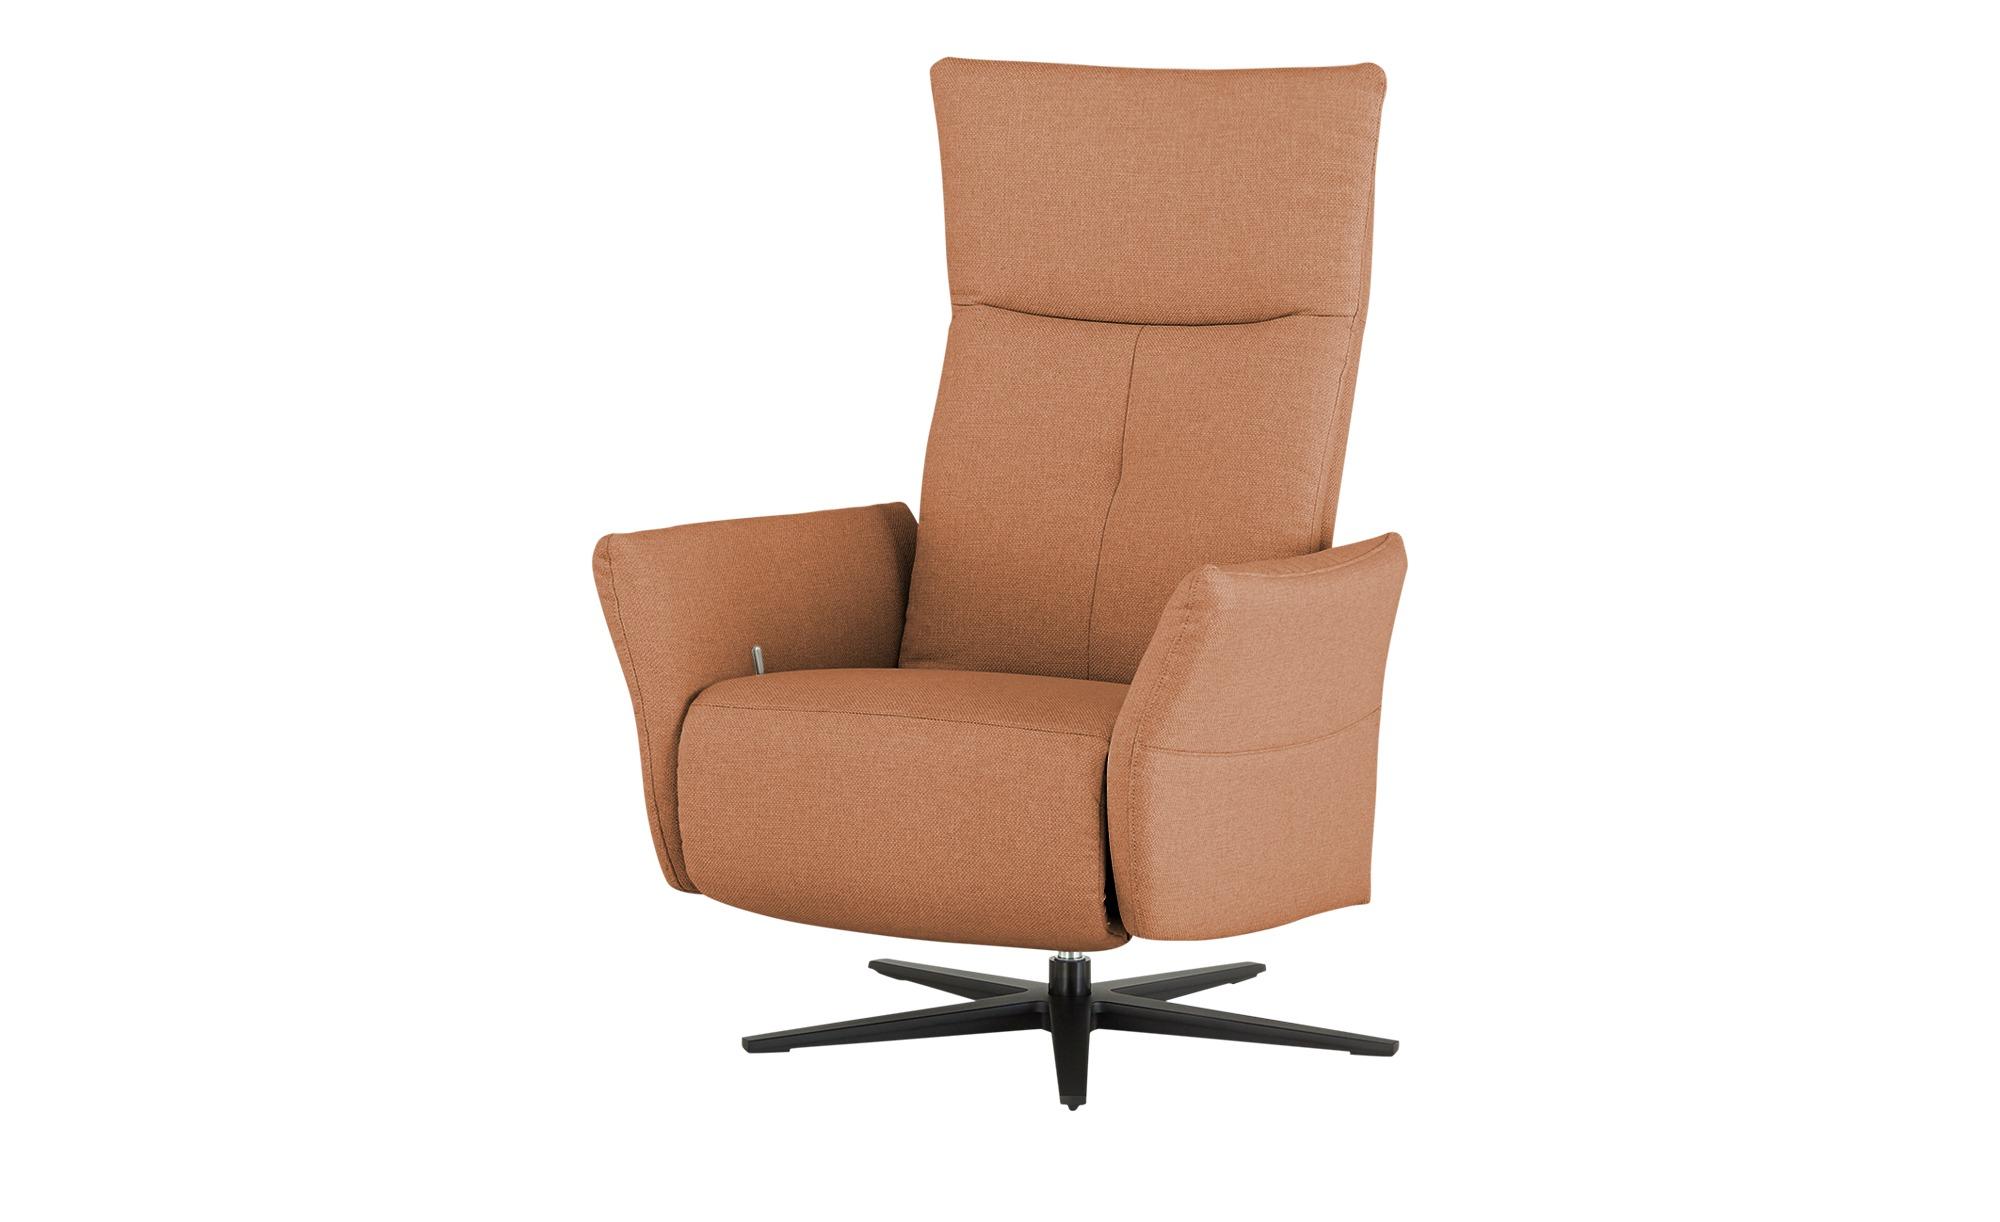 Wohnwert Funktionssessel  Katja ¦ orange ¦ Maße (cm): B: 79 H: 110 T: 80 Polstermöbel > Sessel > Drehsessel - Höffner